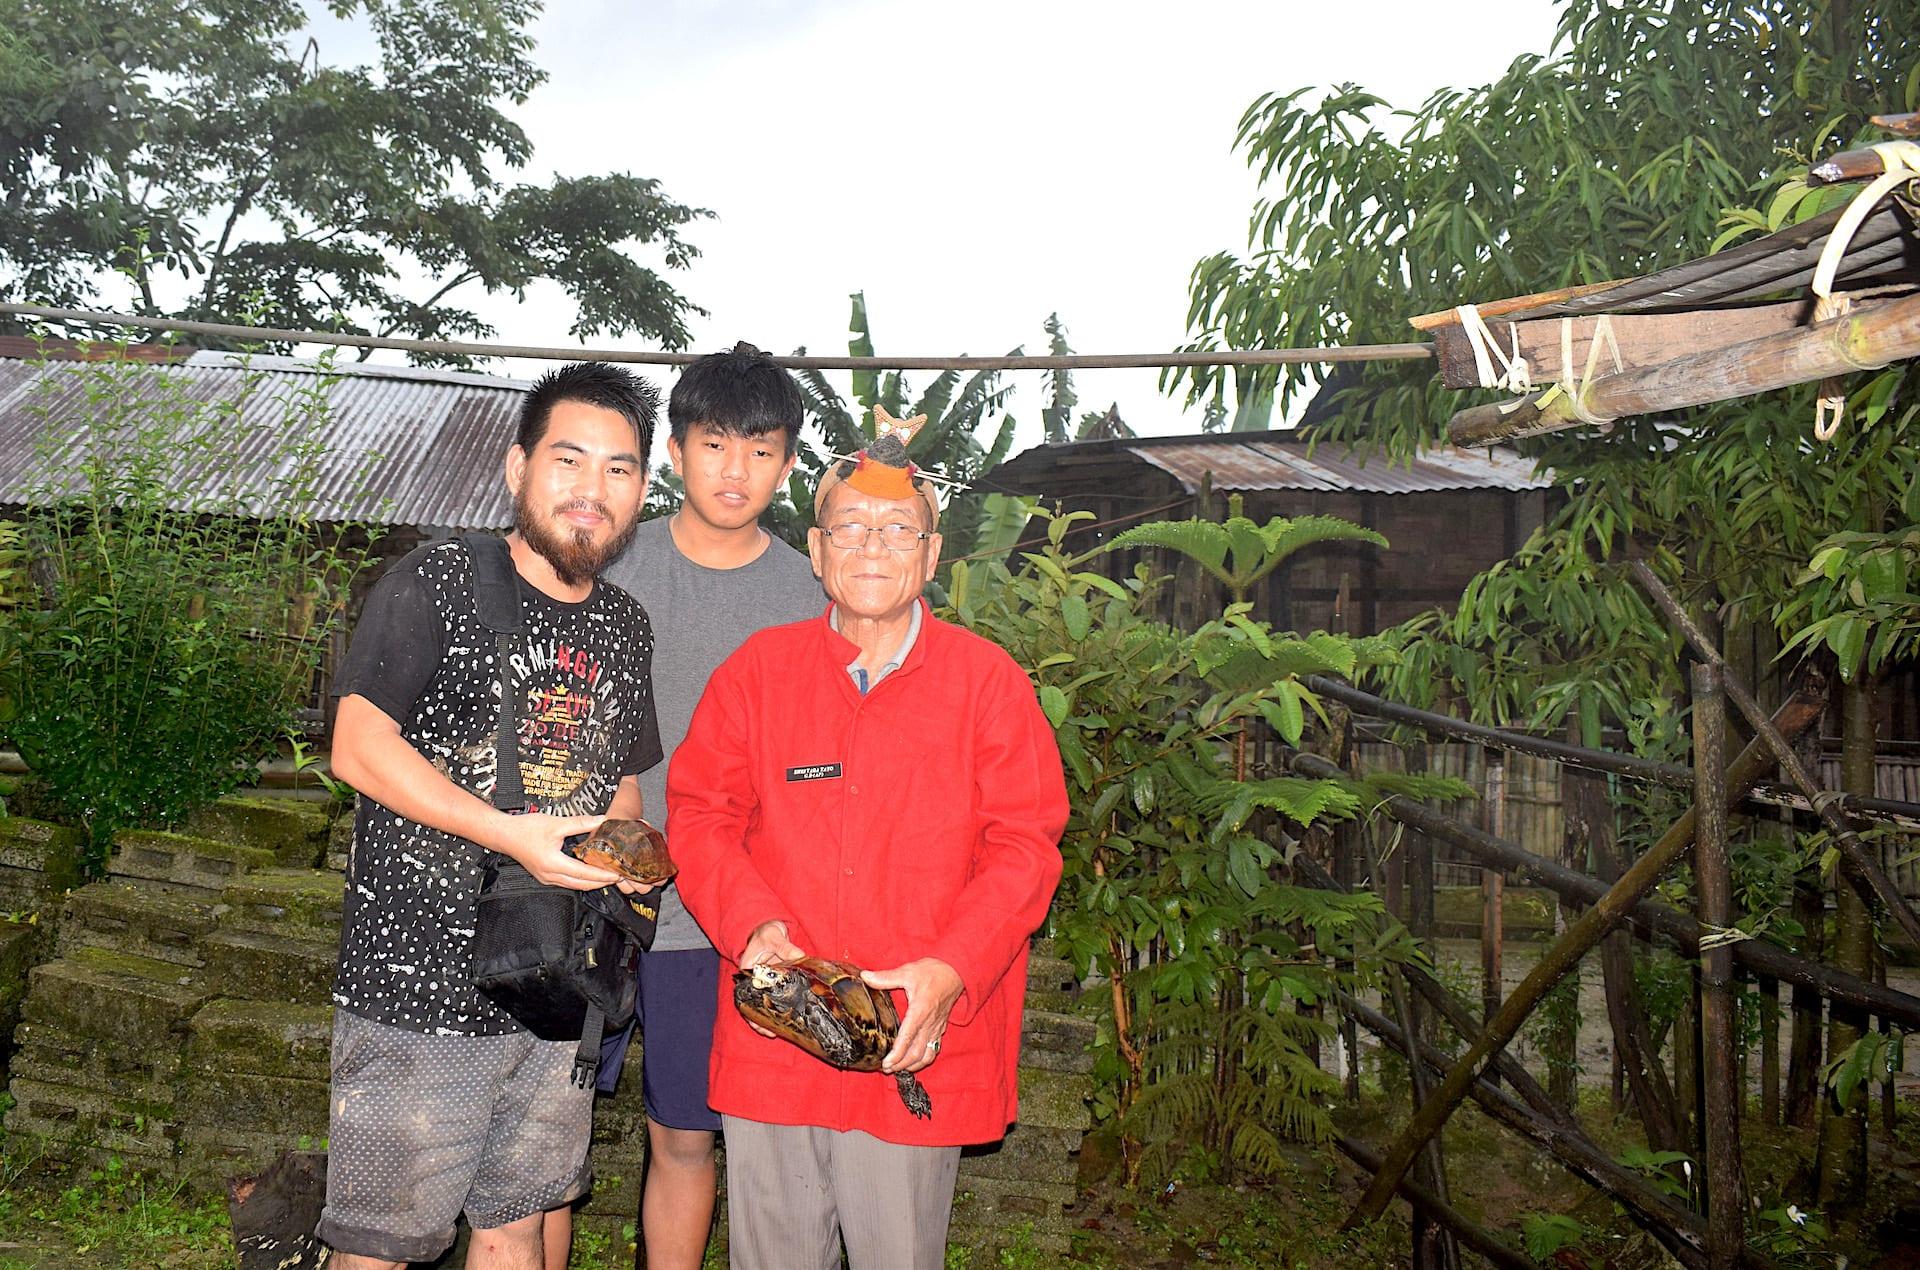 arunachal-pradesh-gaon-bura-spreading-message-conserving-impressed-tortoises